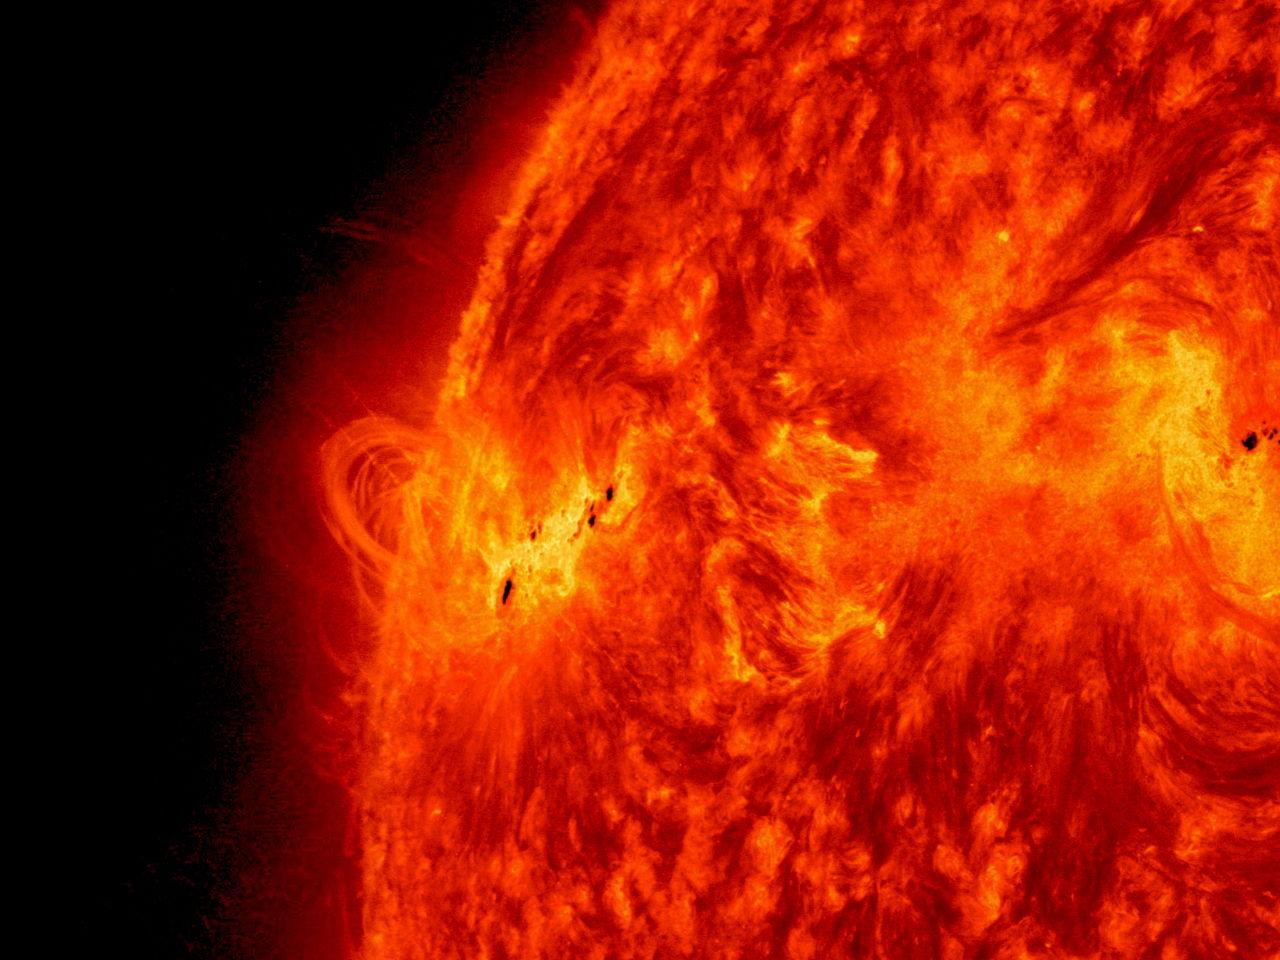 X1.2 Class Solar Flare May 14, 2013